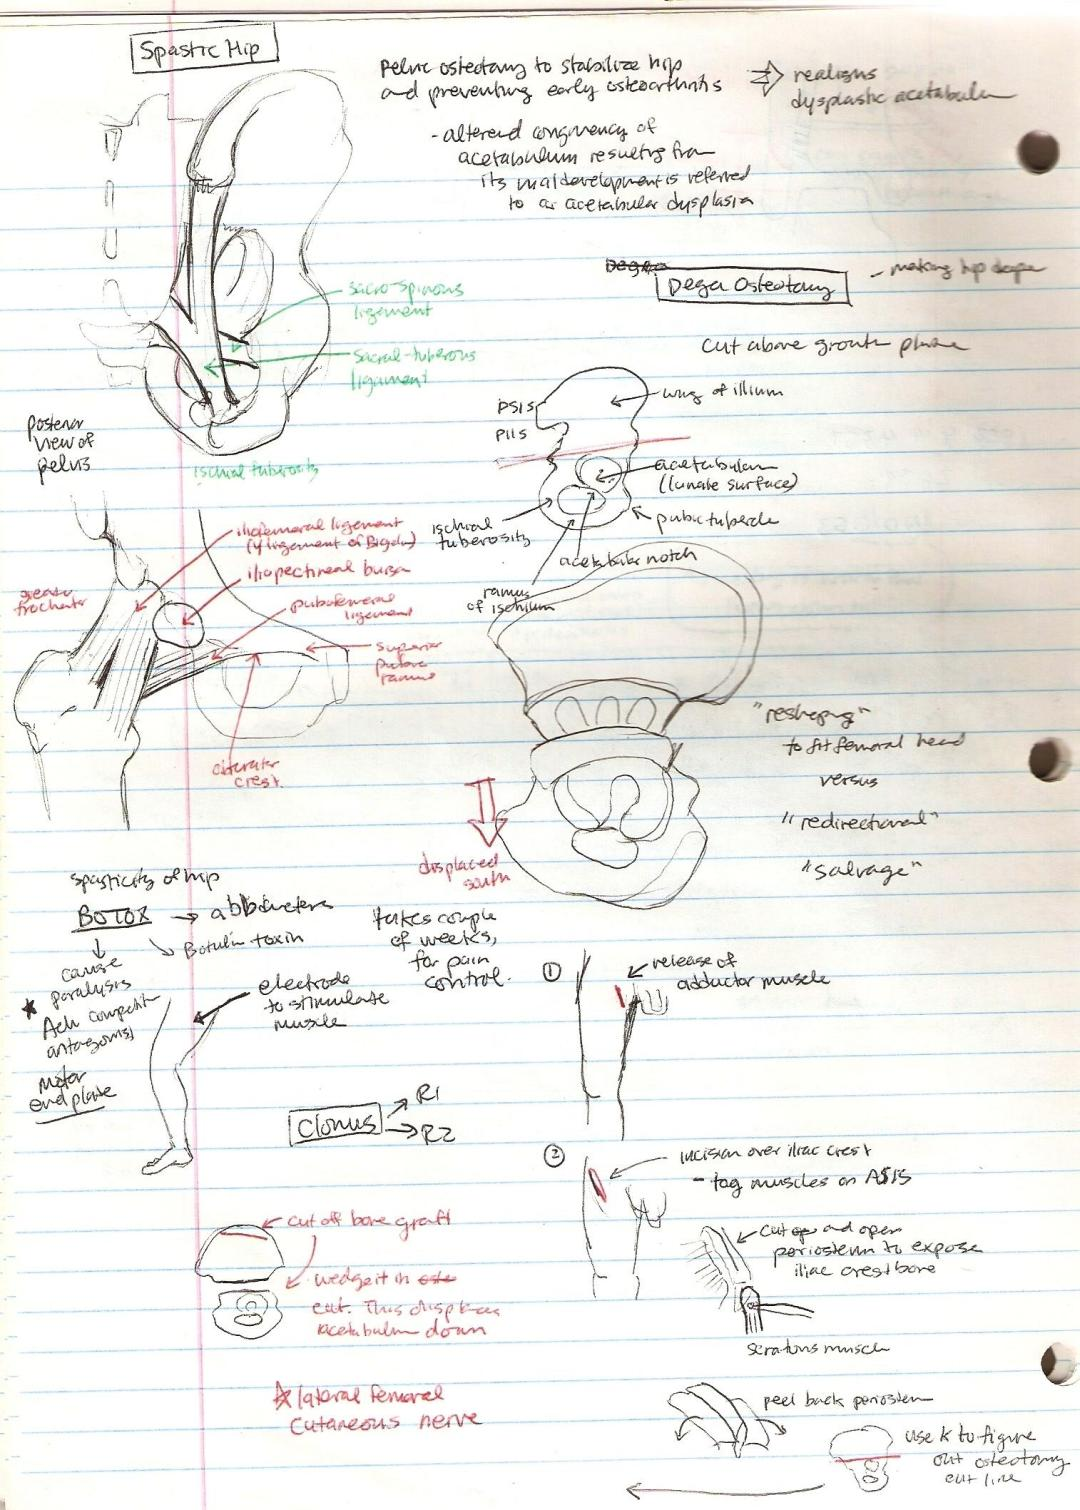 Michiko Maruyama Orthopedic Rotation Dega Osteotomy Diagram